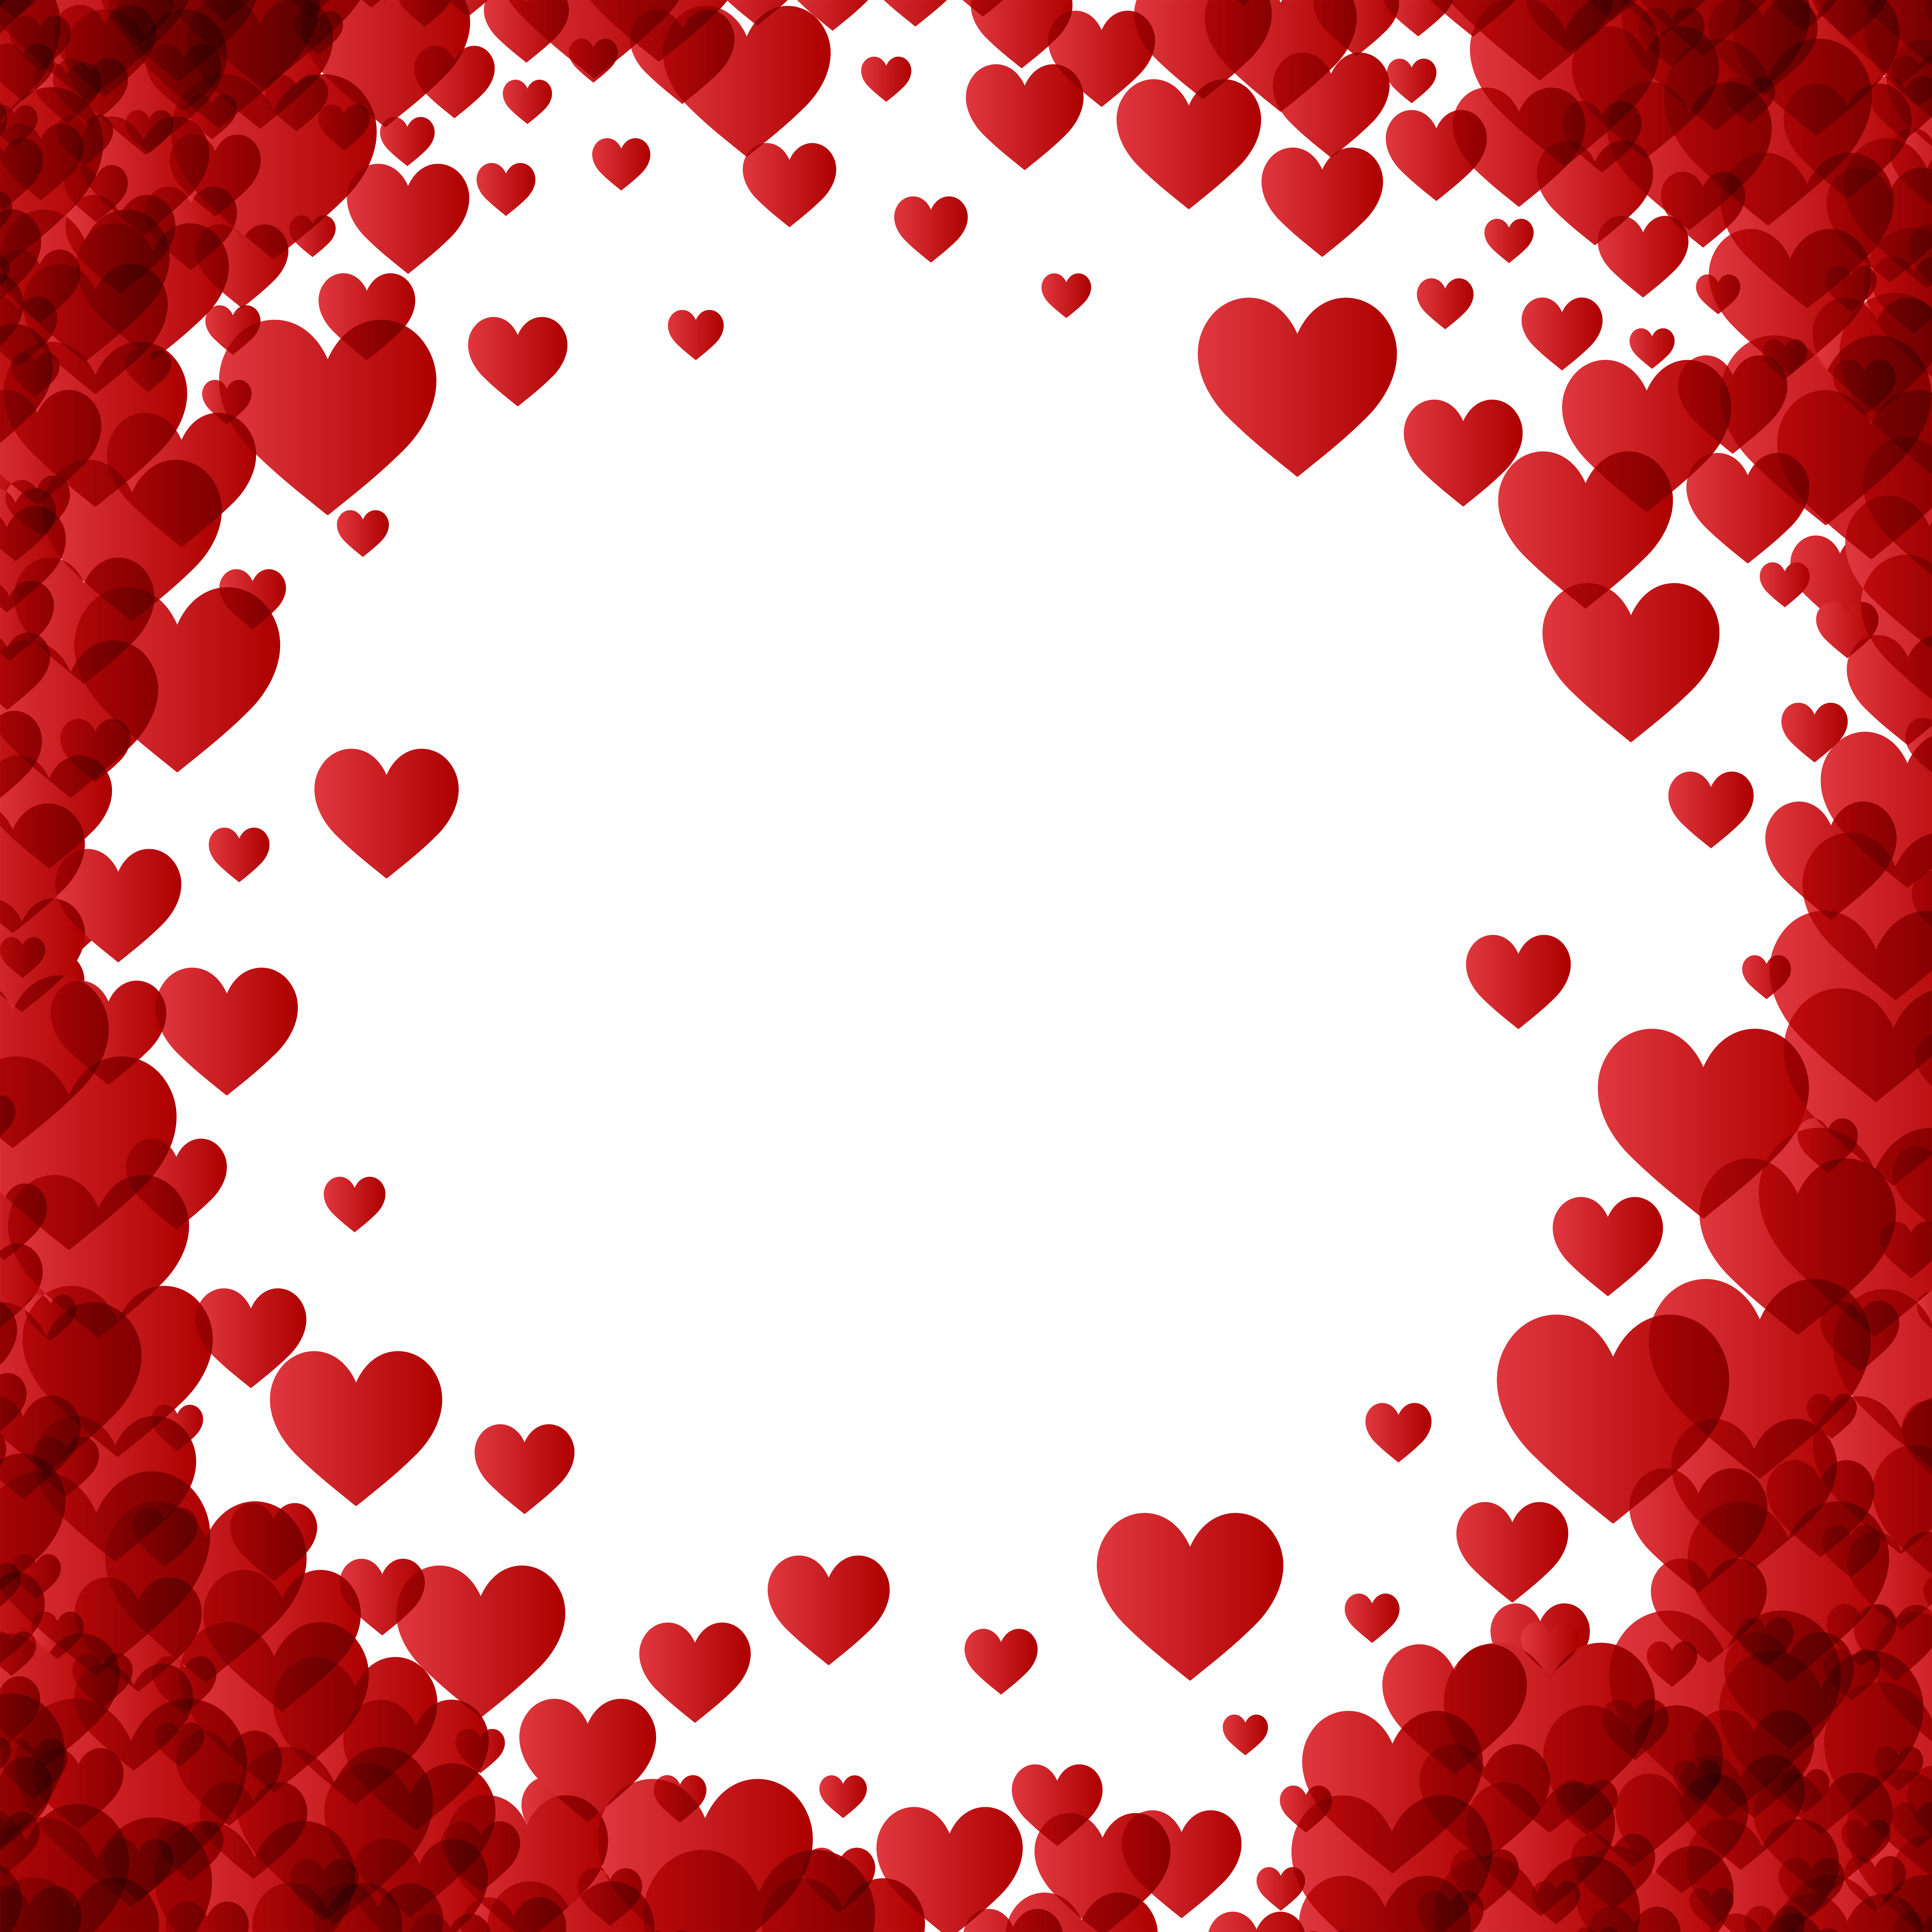 Valentine S Day Heart Border Frame Transparent Image Gallery Yopriceville High Qualit Valentine Background Valentines Day Border Valentines Day Background